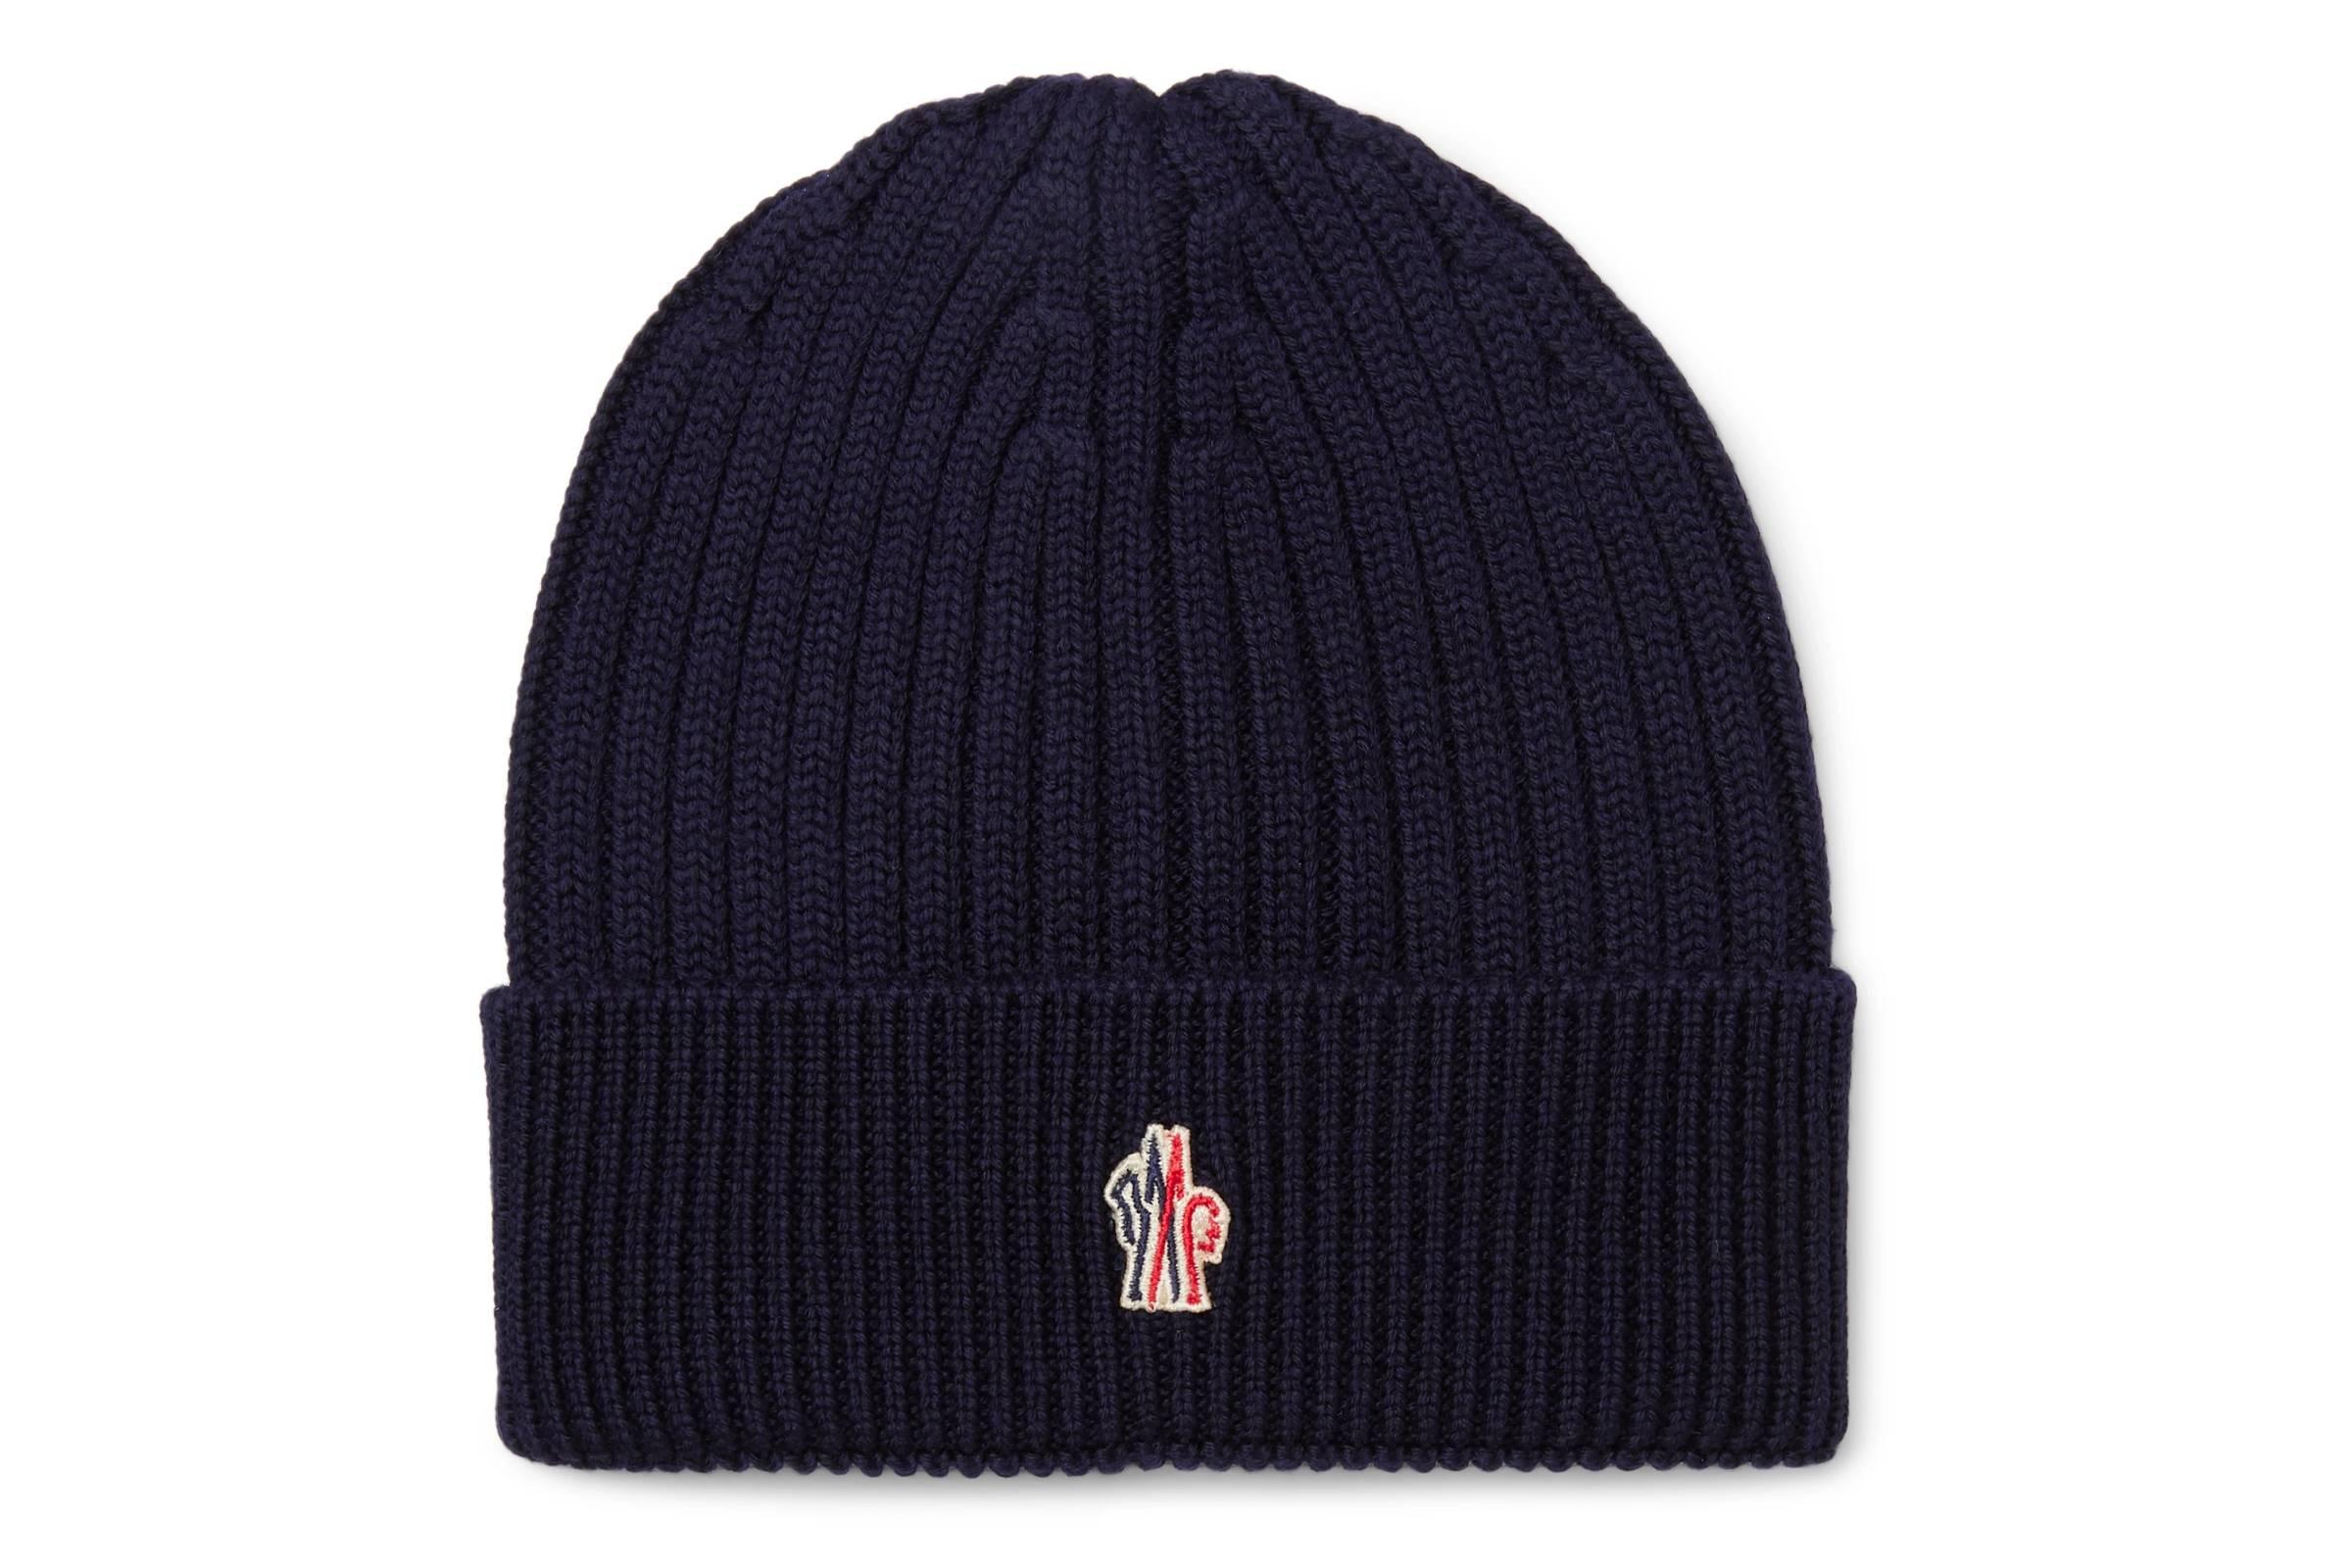 13. Moncler Wool Beanie